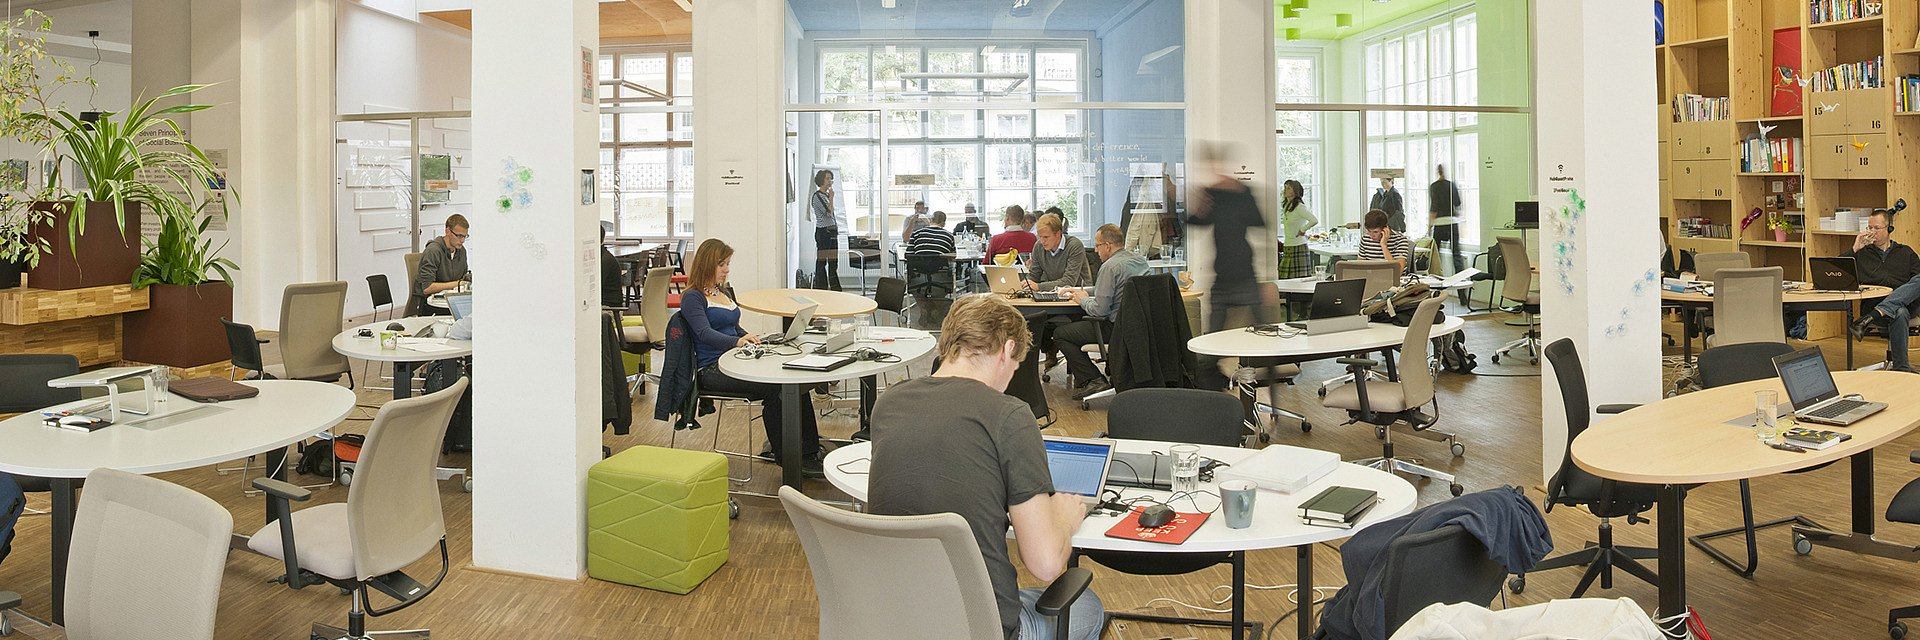 Znamená boom coworkingů synergii nebo kanibalismus?